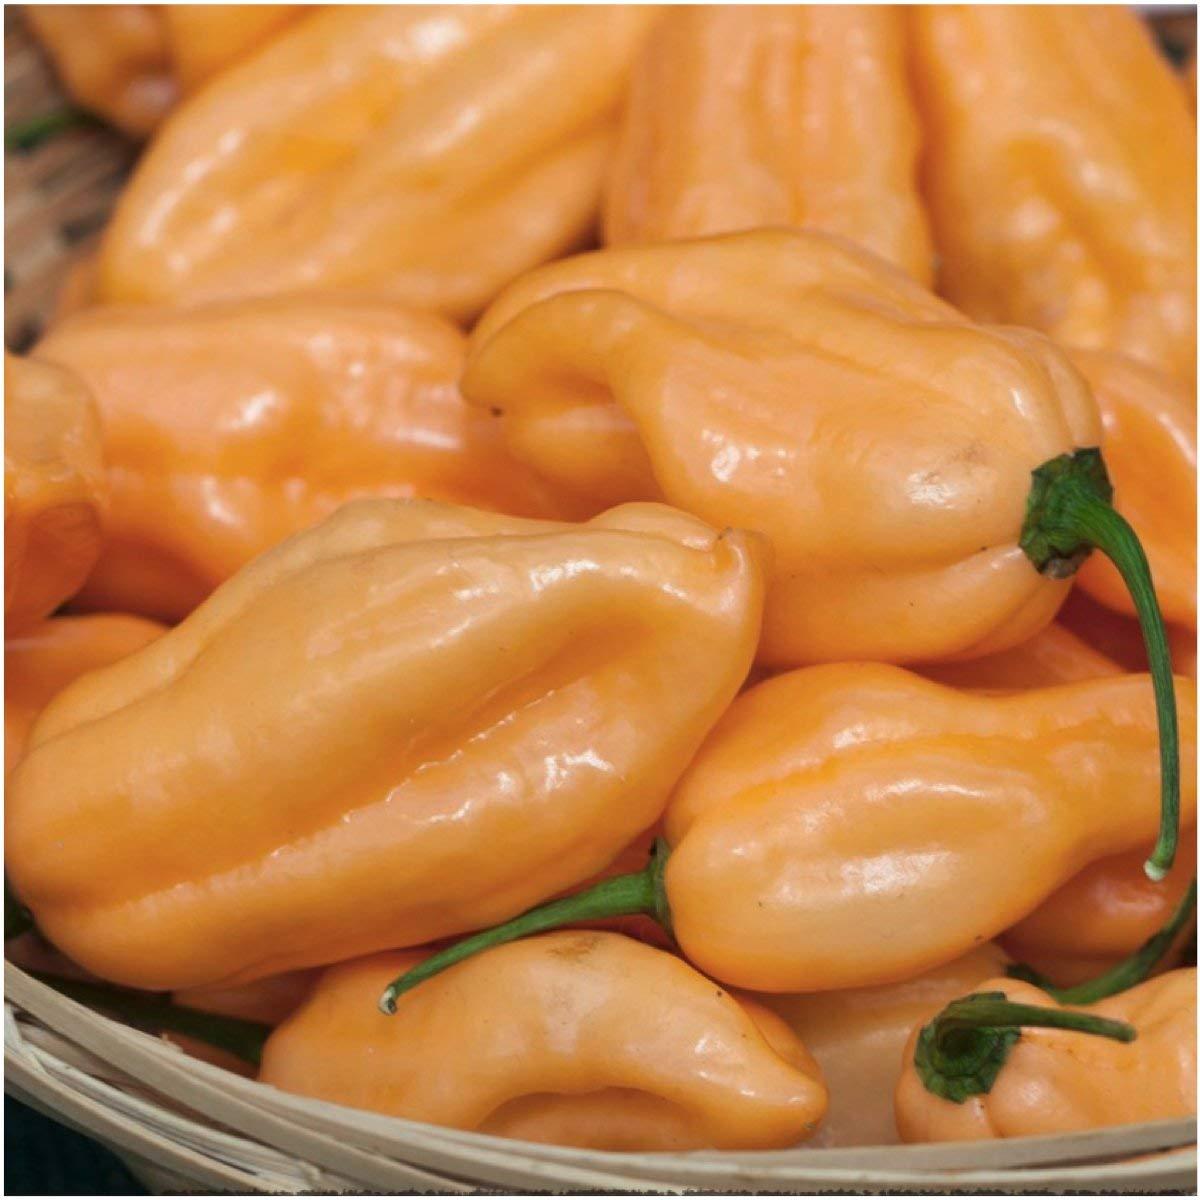 Peach Habanero: Sweet Looks